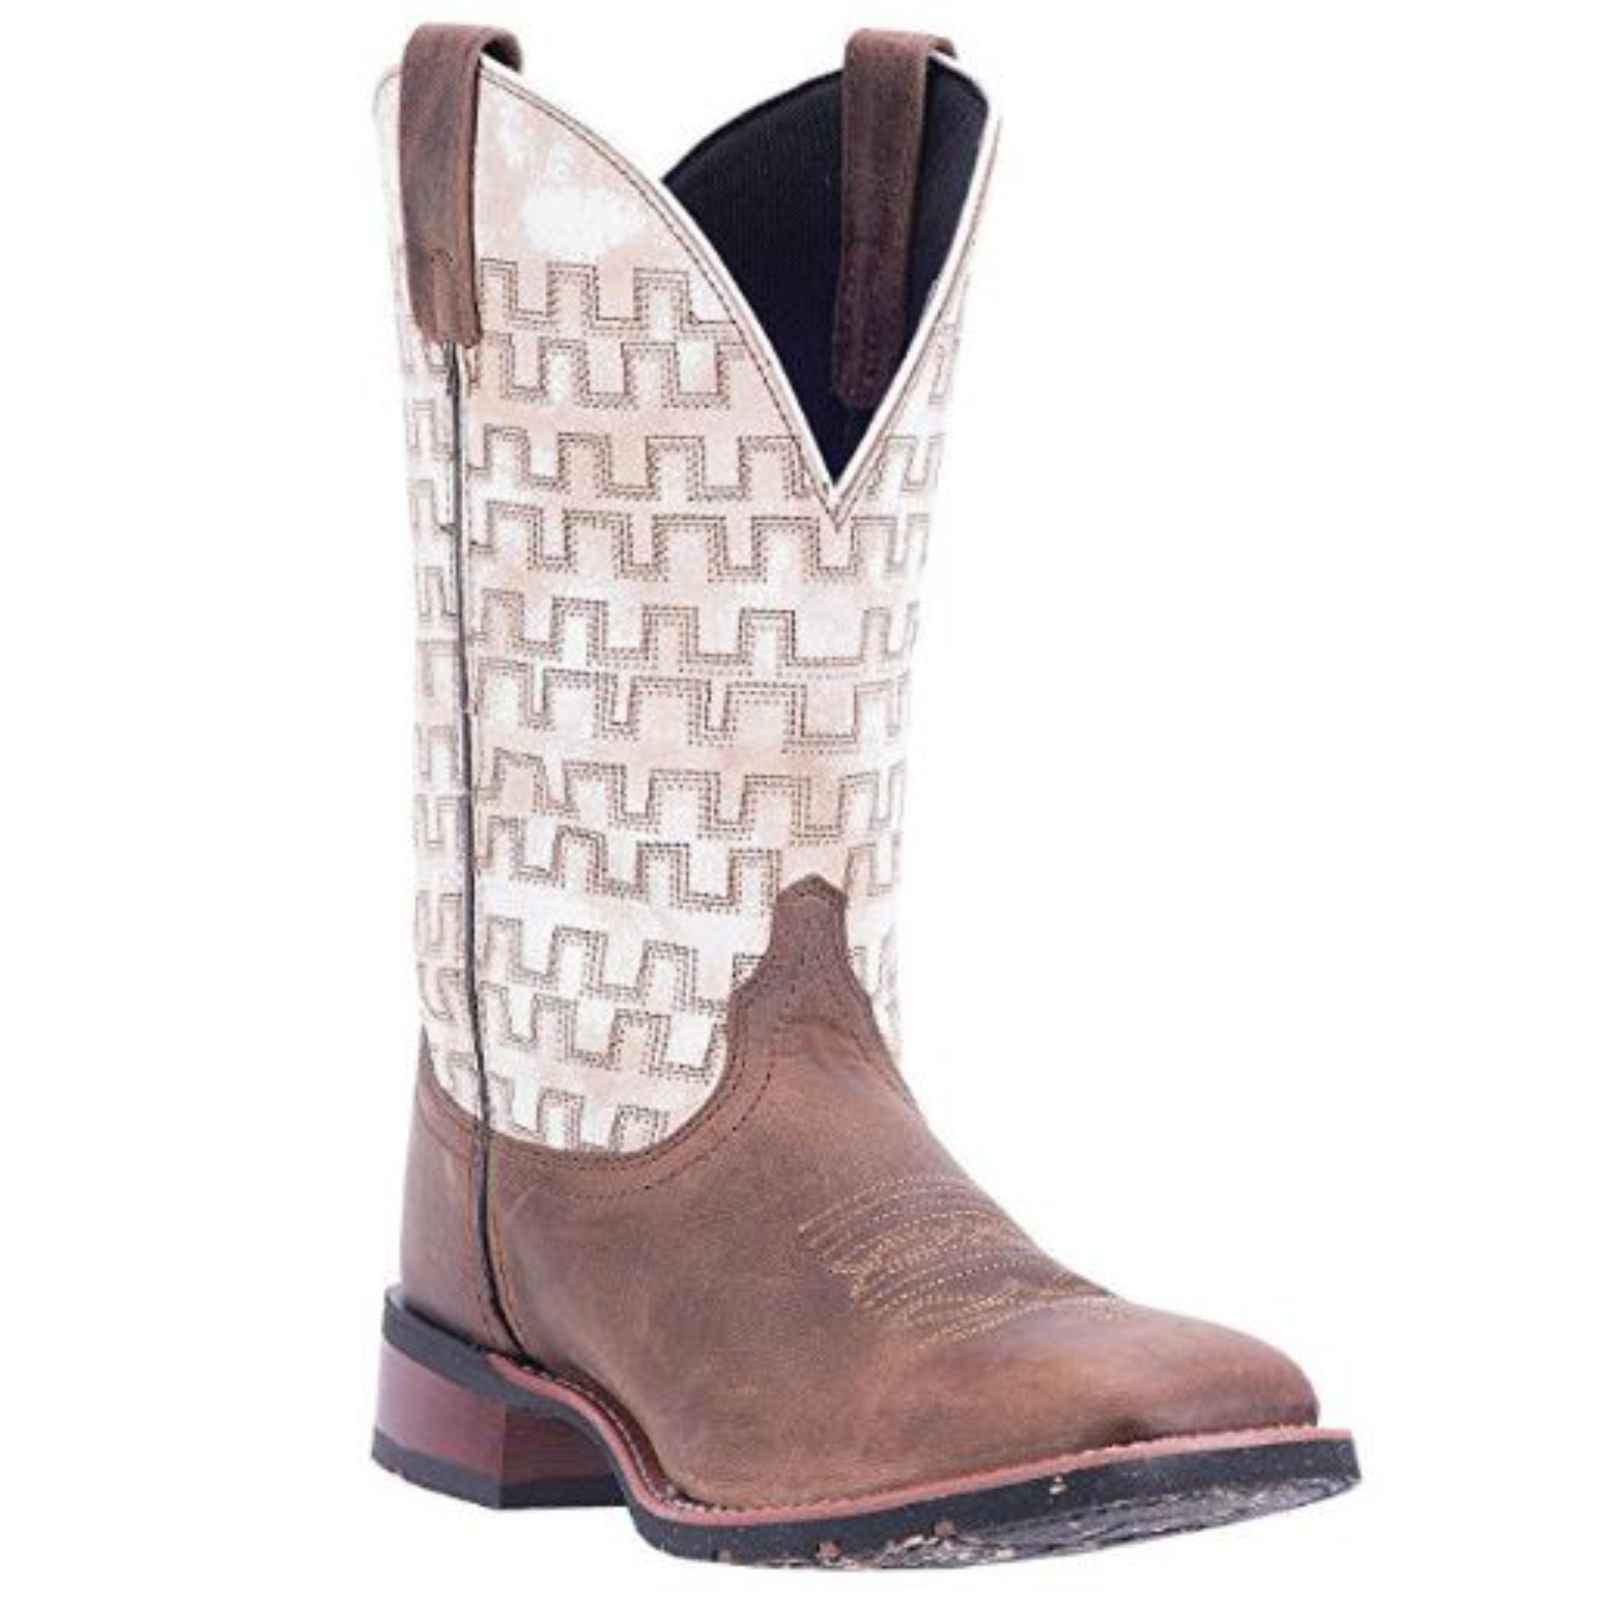 "Dan Post Men's 11"" Sand White Broad Square Toe Ultra-Light Boots, 7811 by DAN POST"